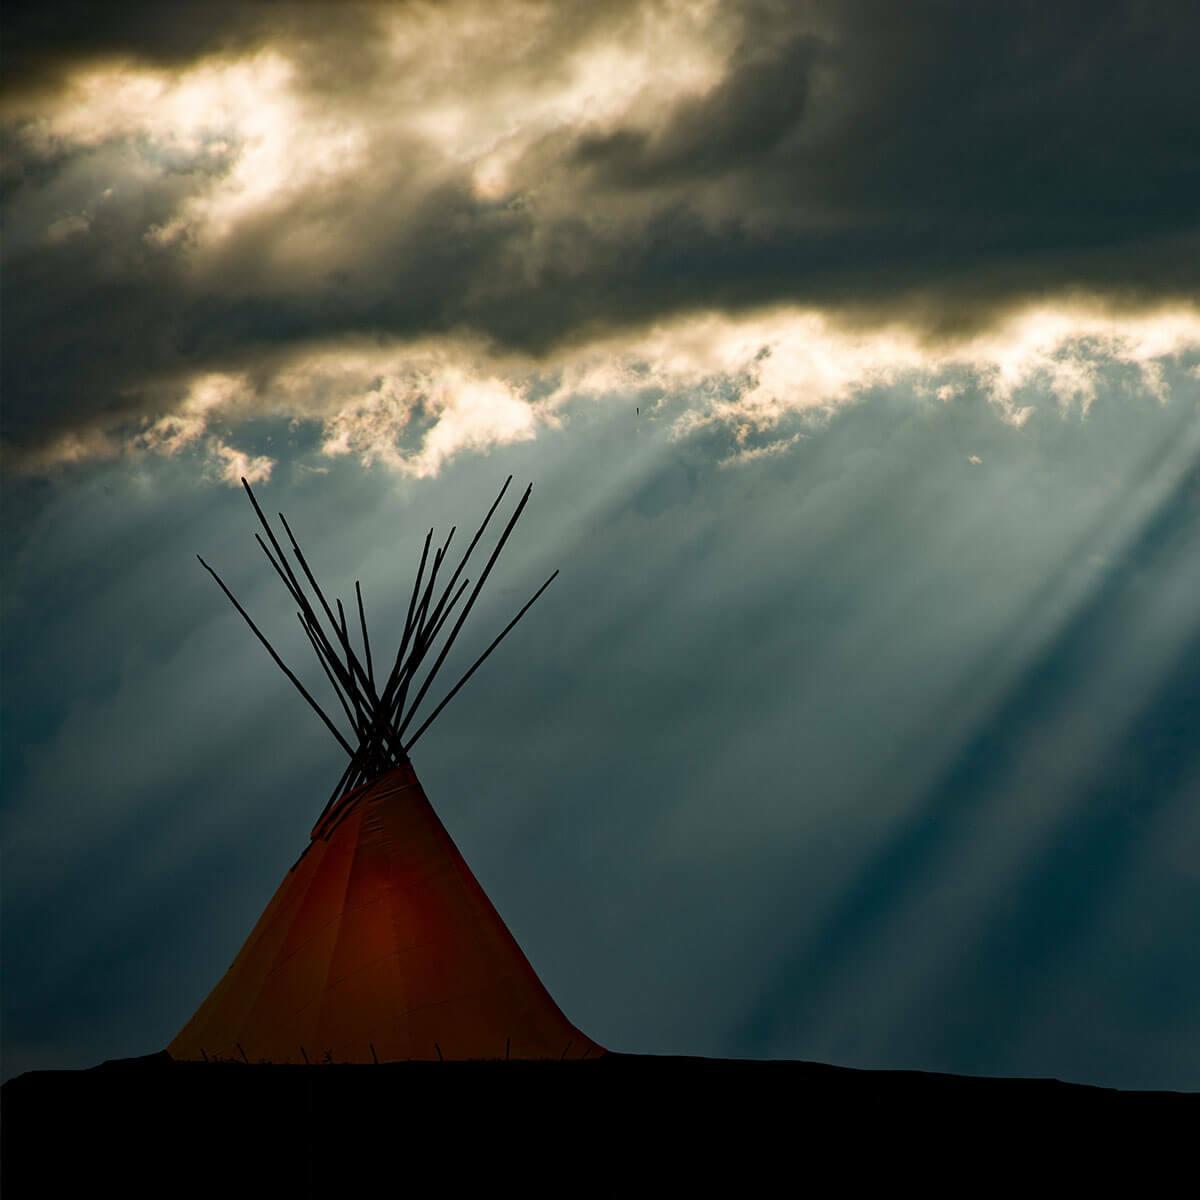 Tepee under a cloud filled sky